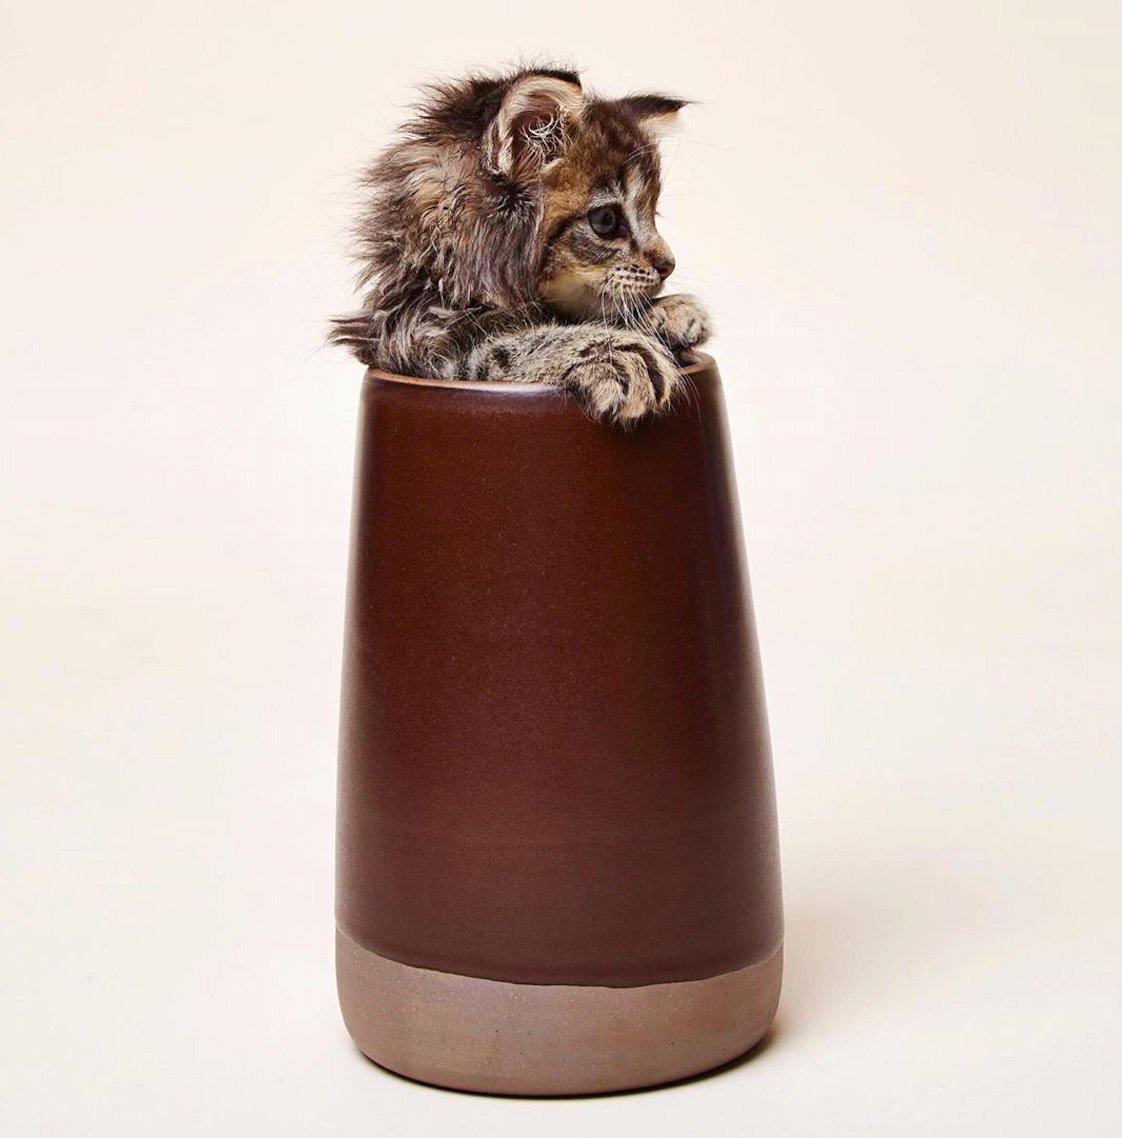 East Fork Pottery vase